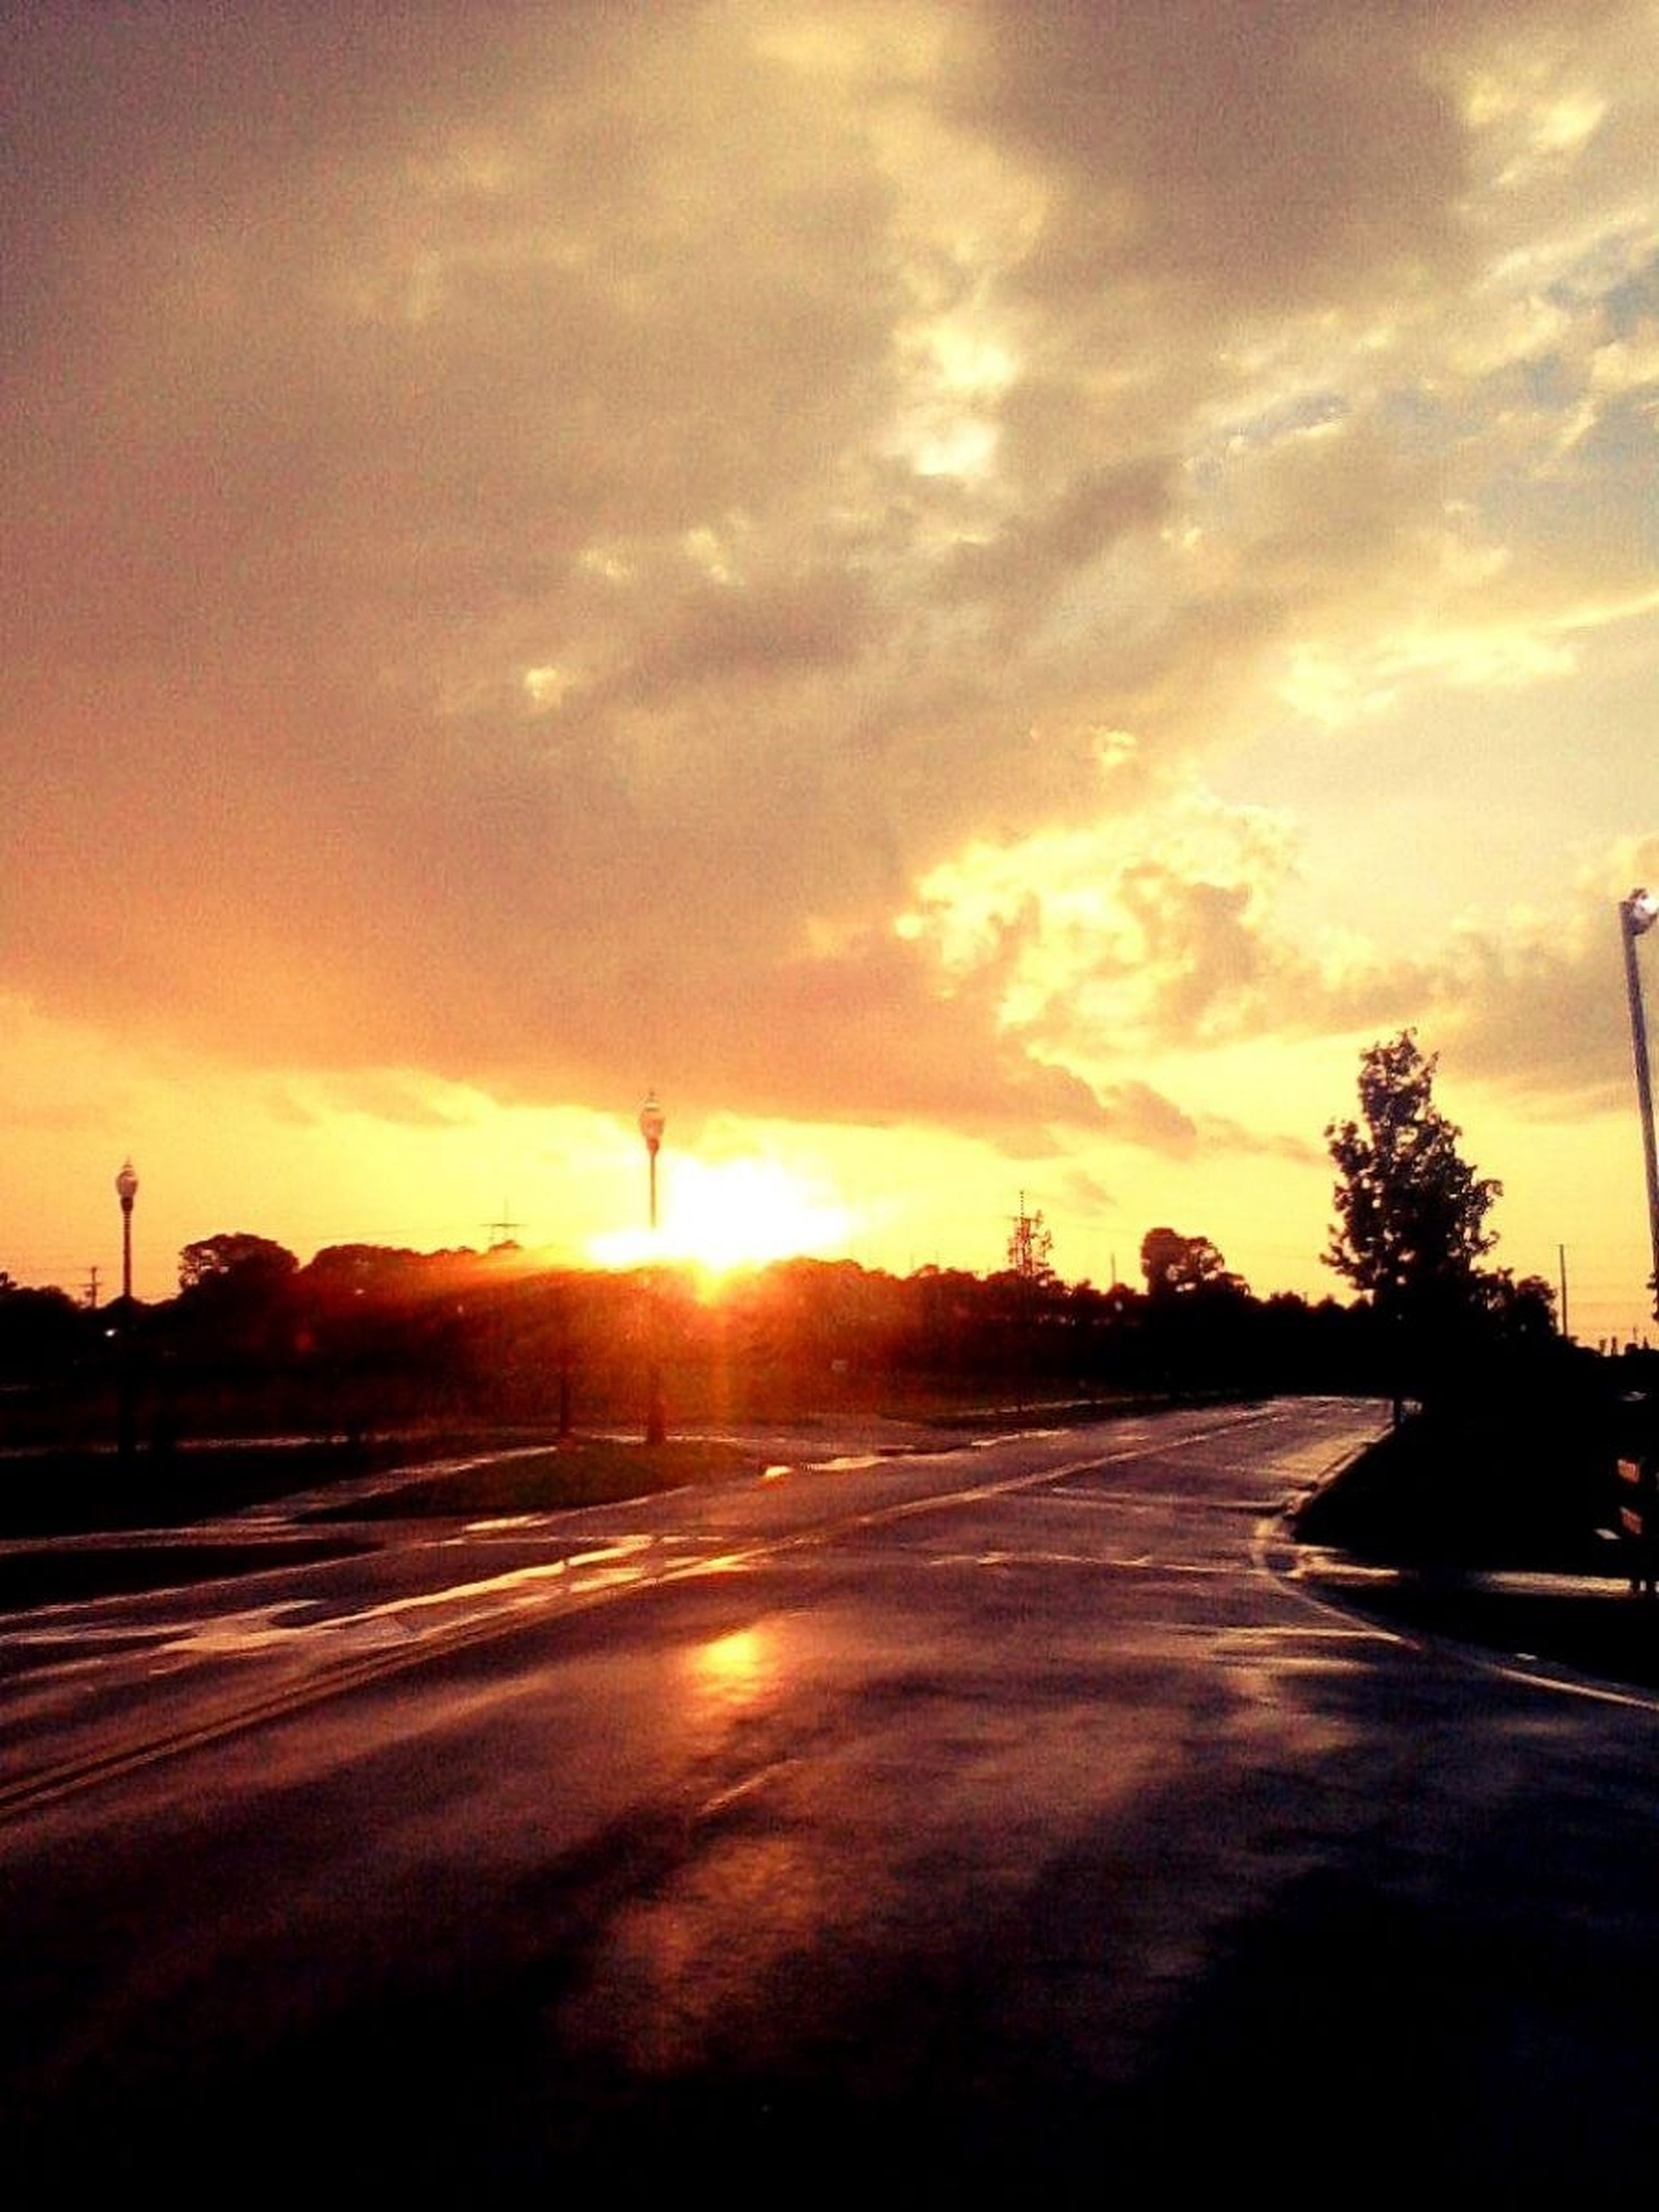 sunset, sun, orange color, sky, tranquil scene, scenics, tranquility, beauty in nature, silhouette, road, cloud - sky, nature, tree, idyllic, sunlight, landscape, dramatic sky, cloud, back lit, outdoors